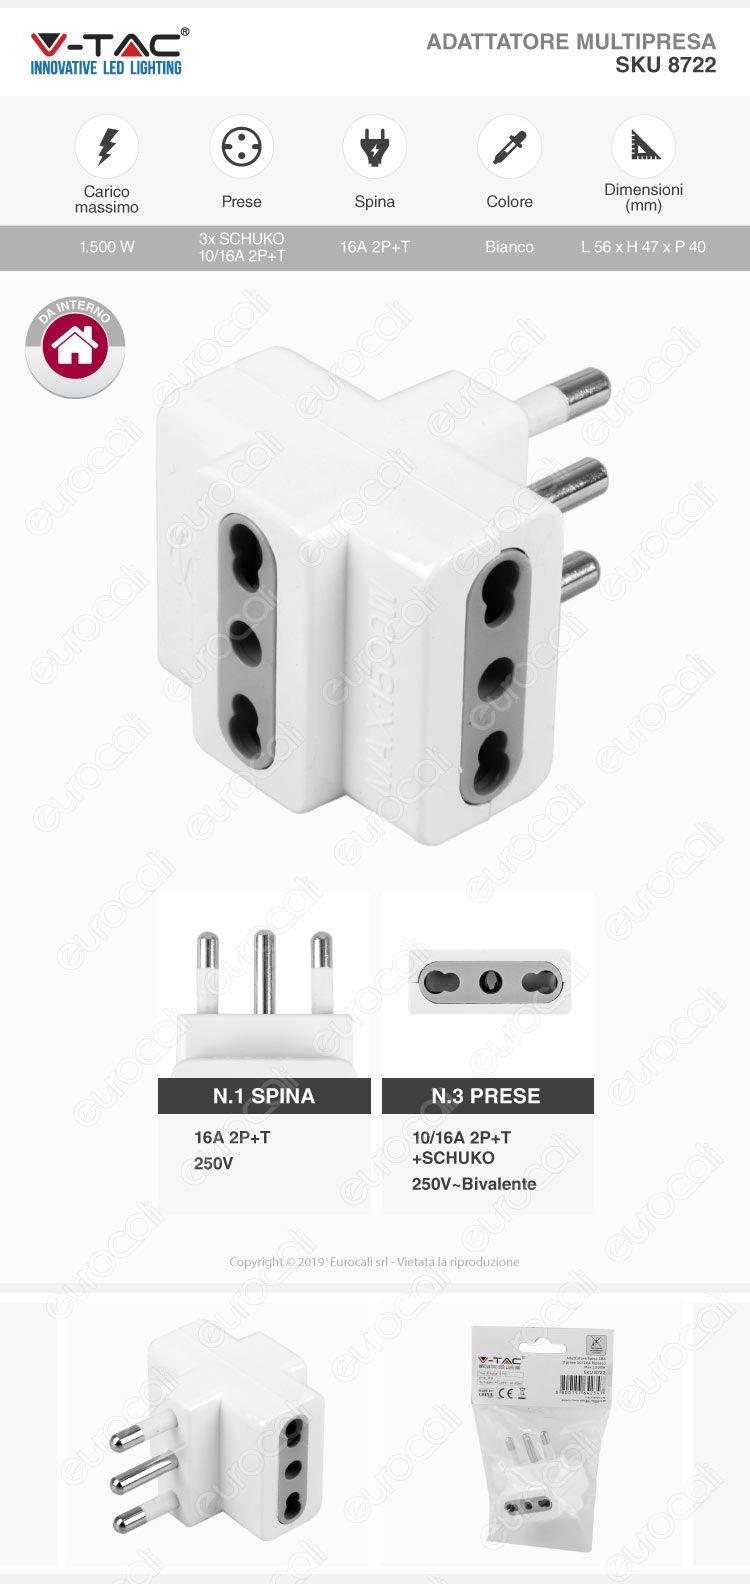 V-Tac Multipresa Adattatore Triplo con Spina 16A